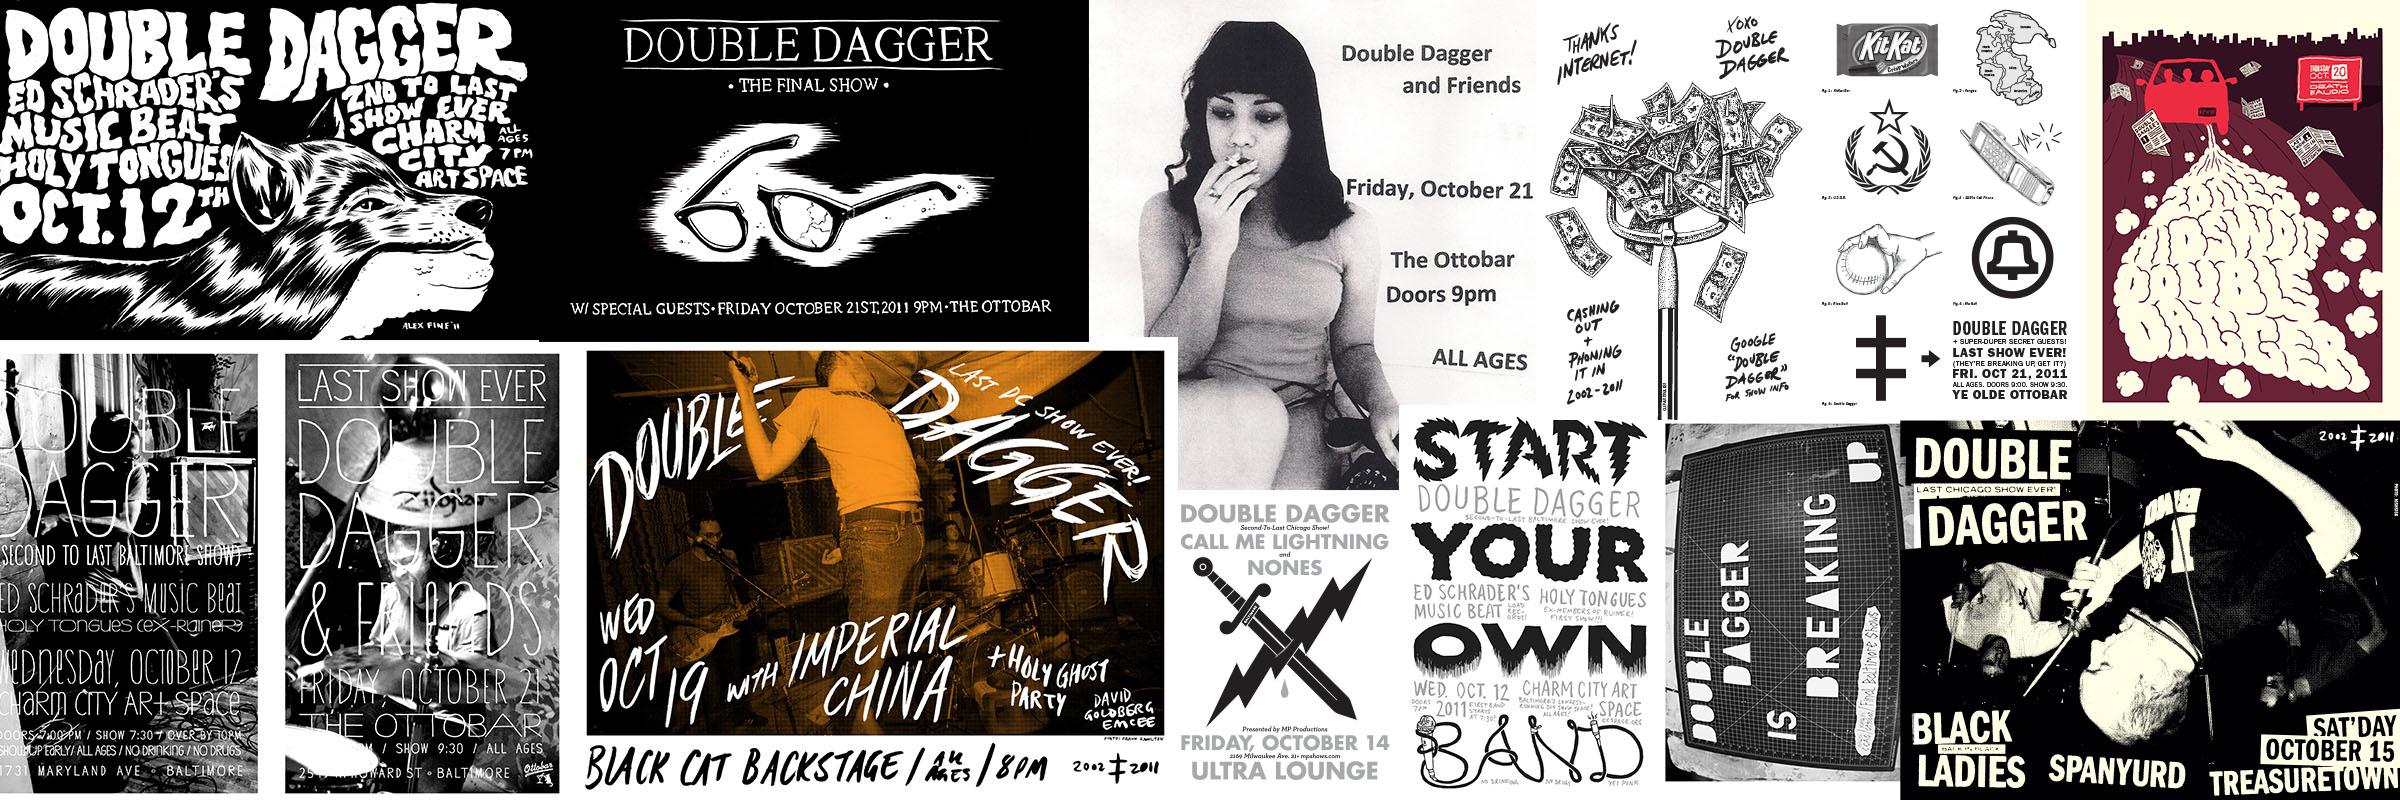 Double Dagger's homemade final tour flyers.